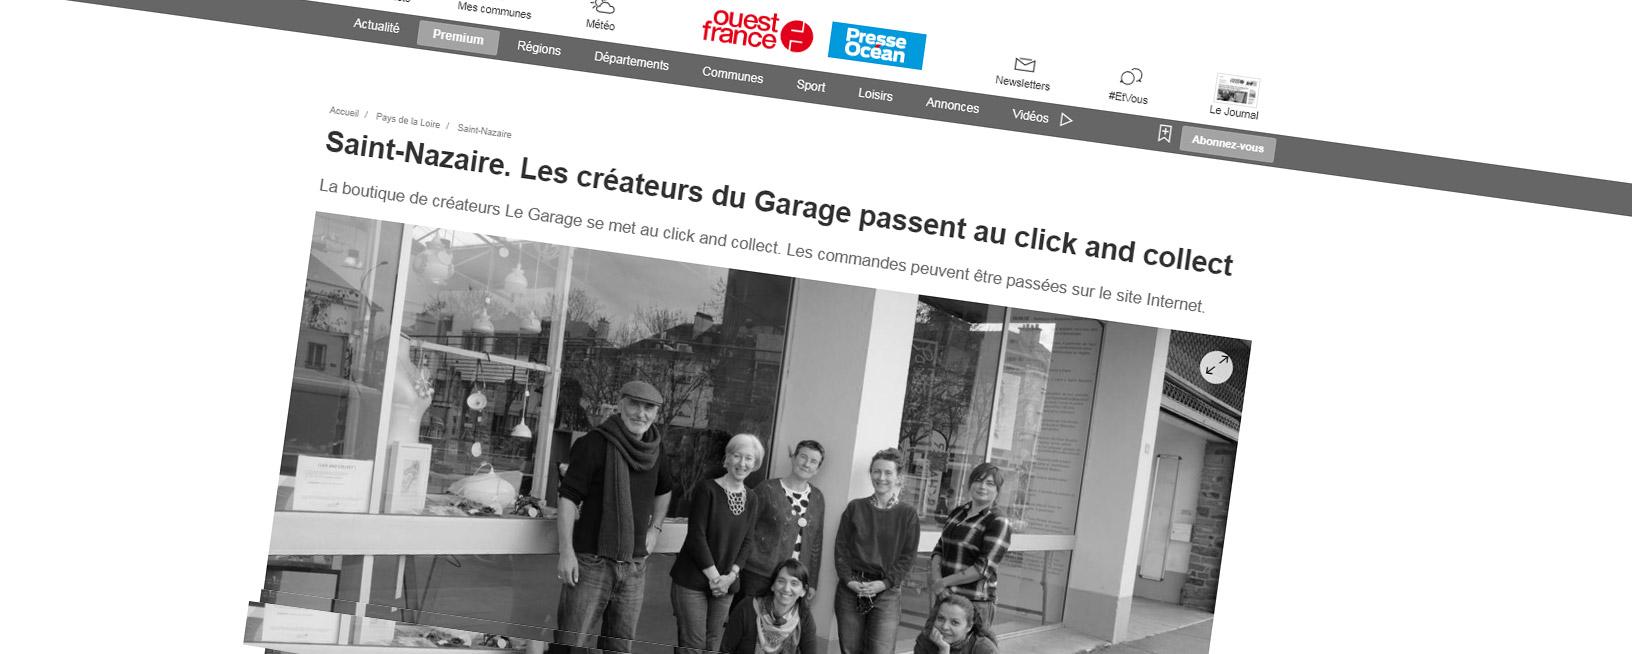 Article Presse 21-04-09